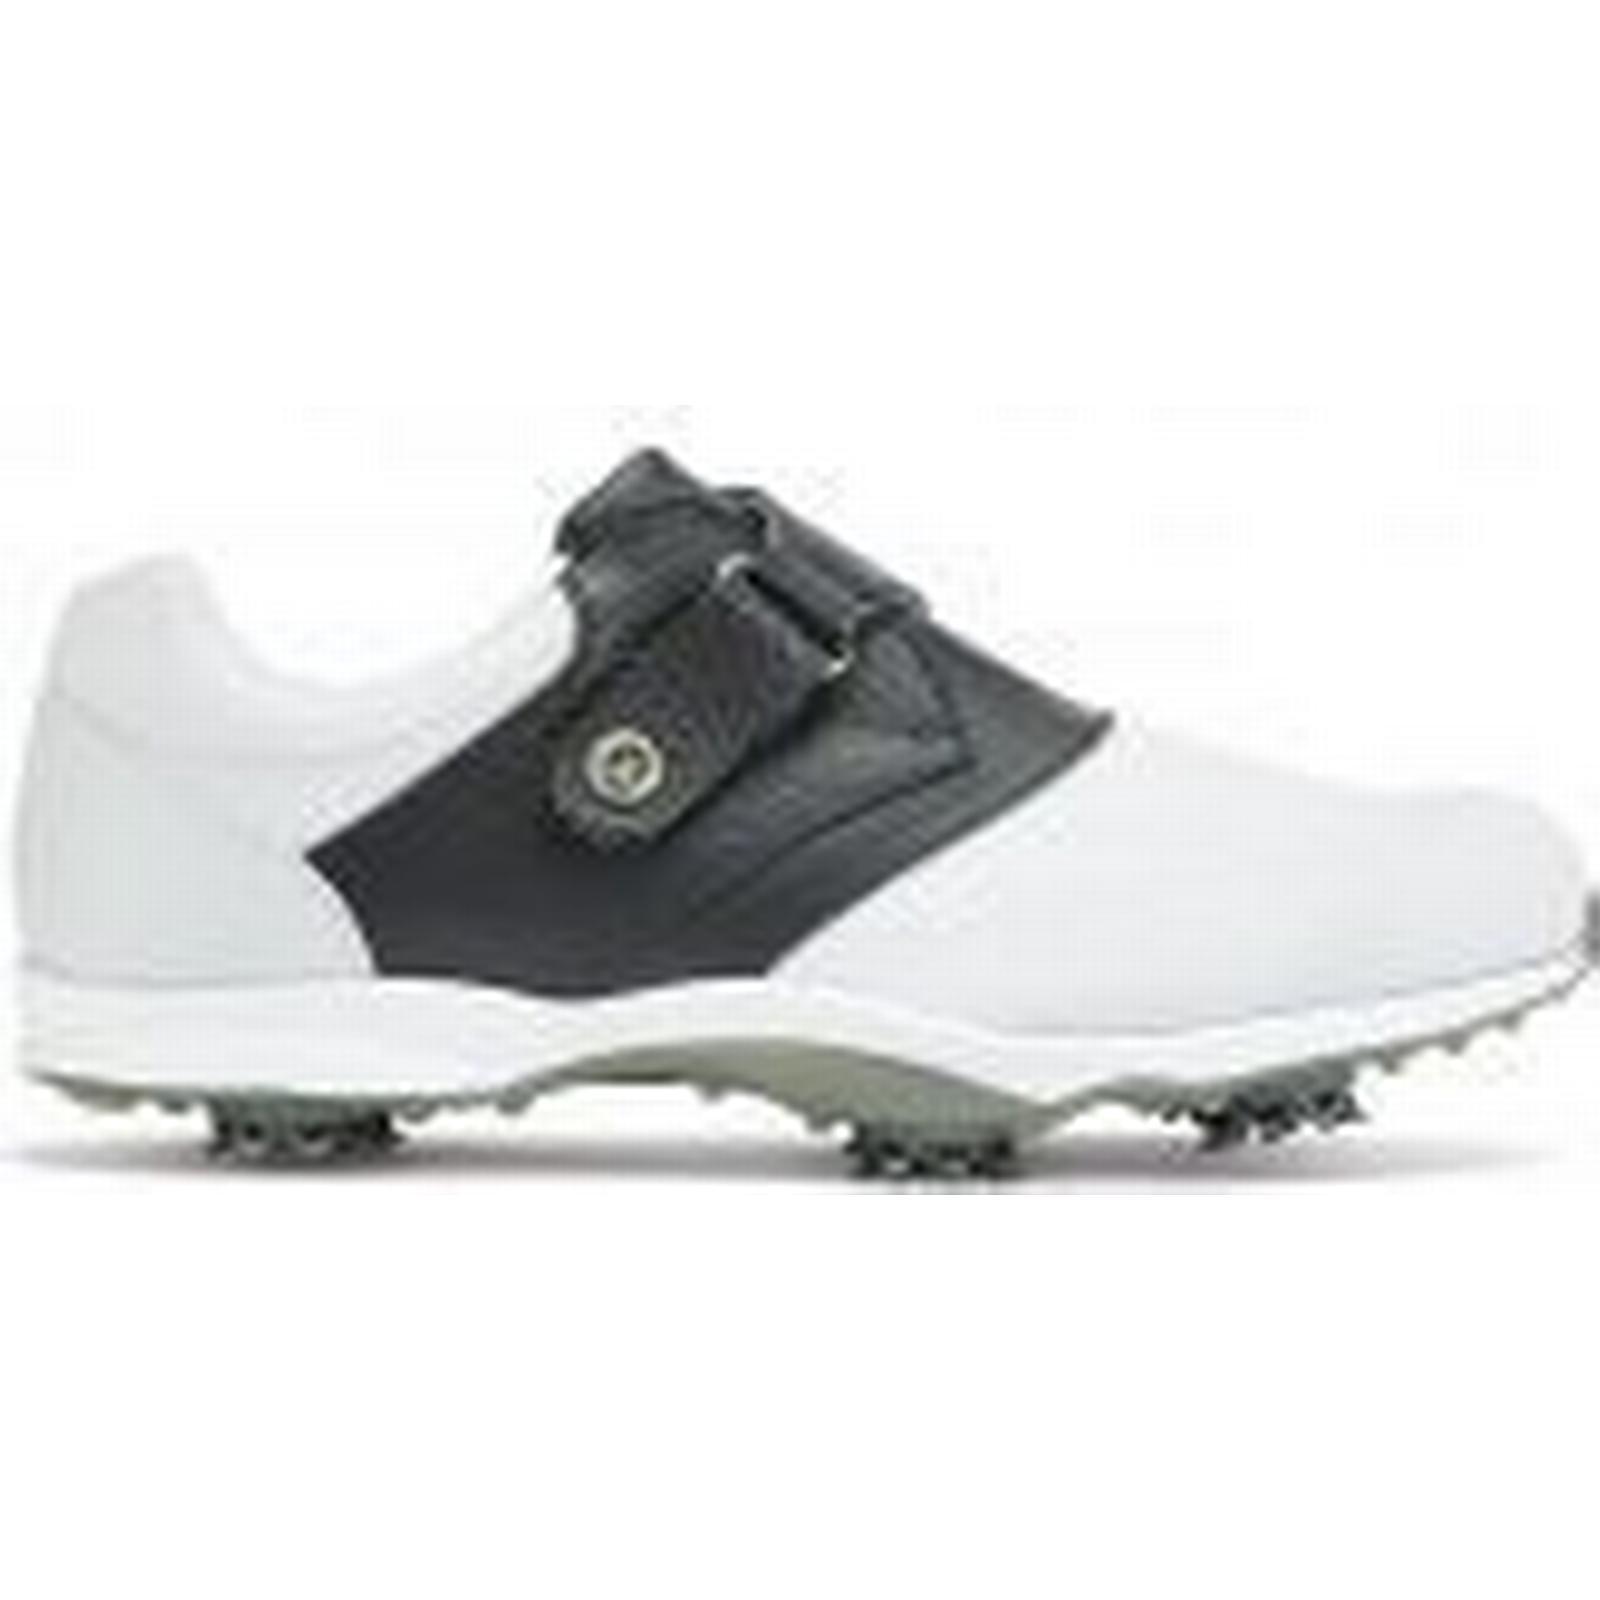 EmBODY 18 Ladies Shoes Velcro Golf Shoes Ladies - White/Navy e61b44